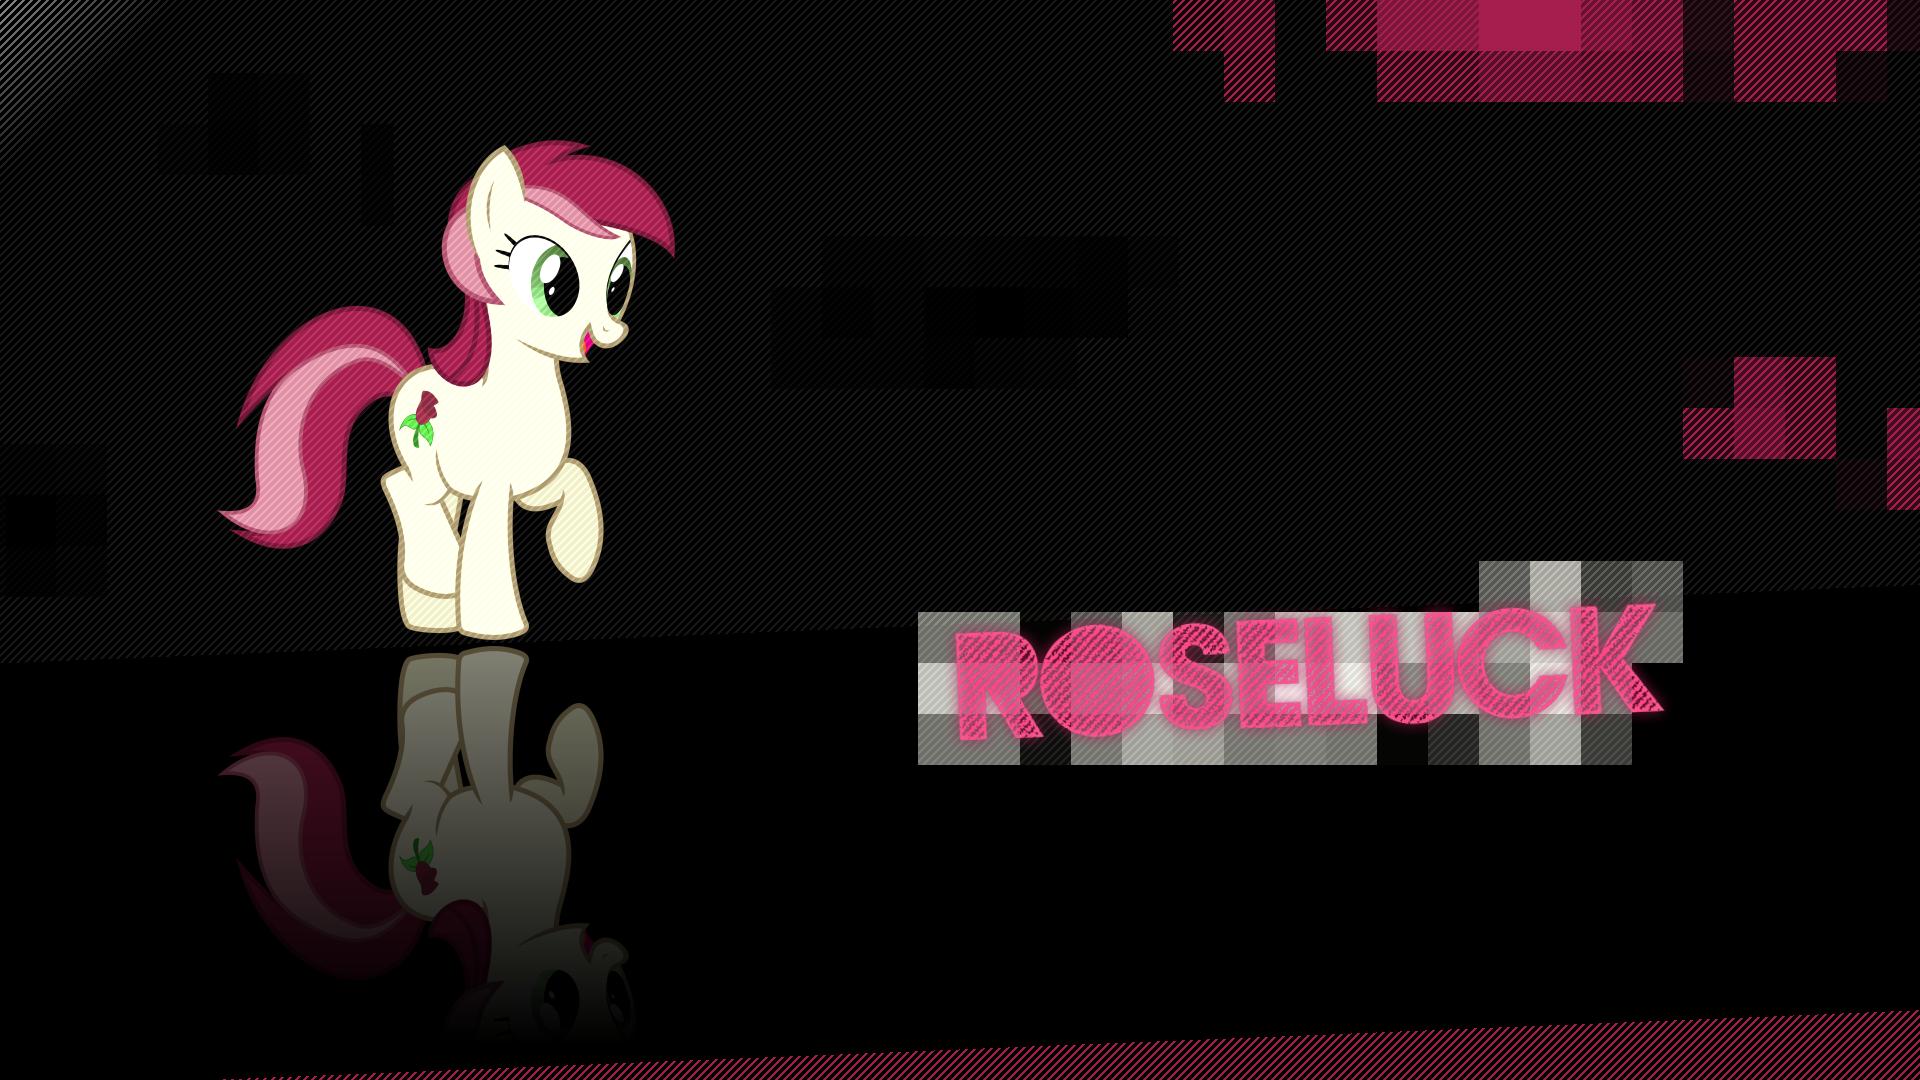 Roseluck 16 by Lktronikamui